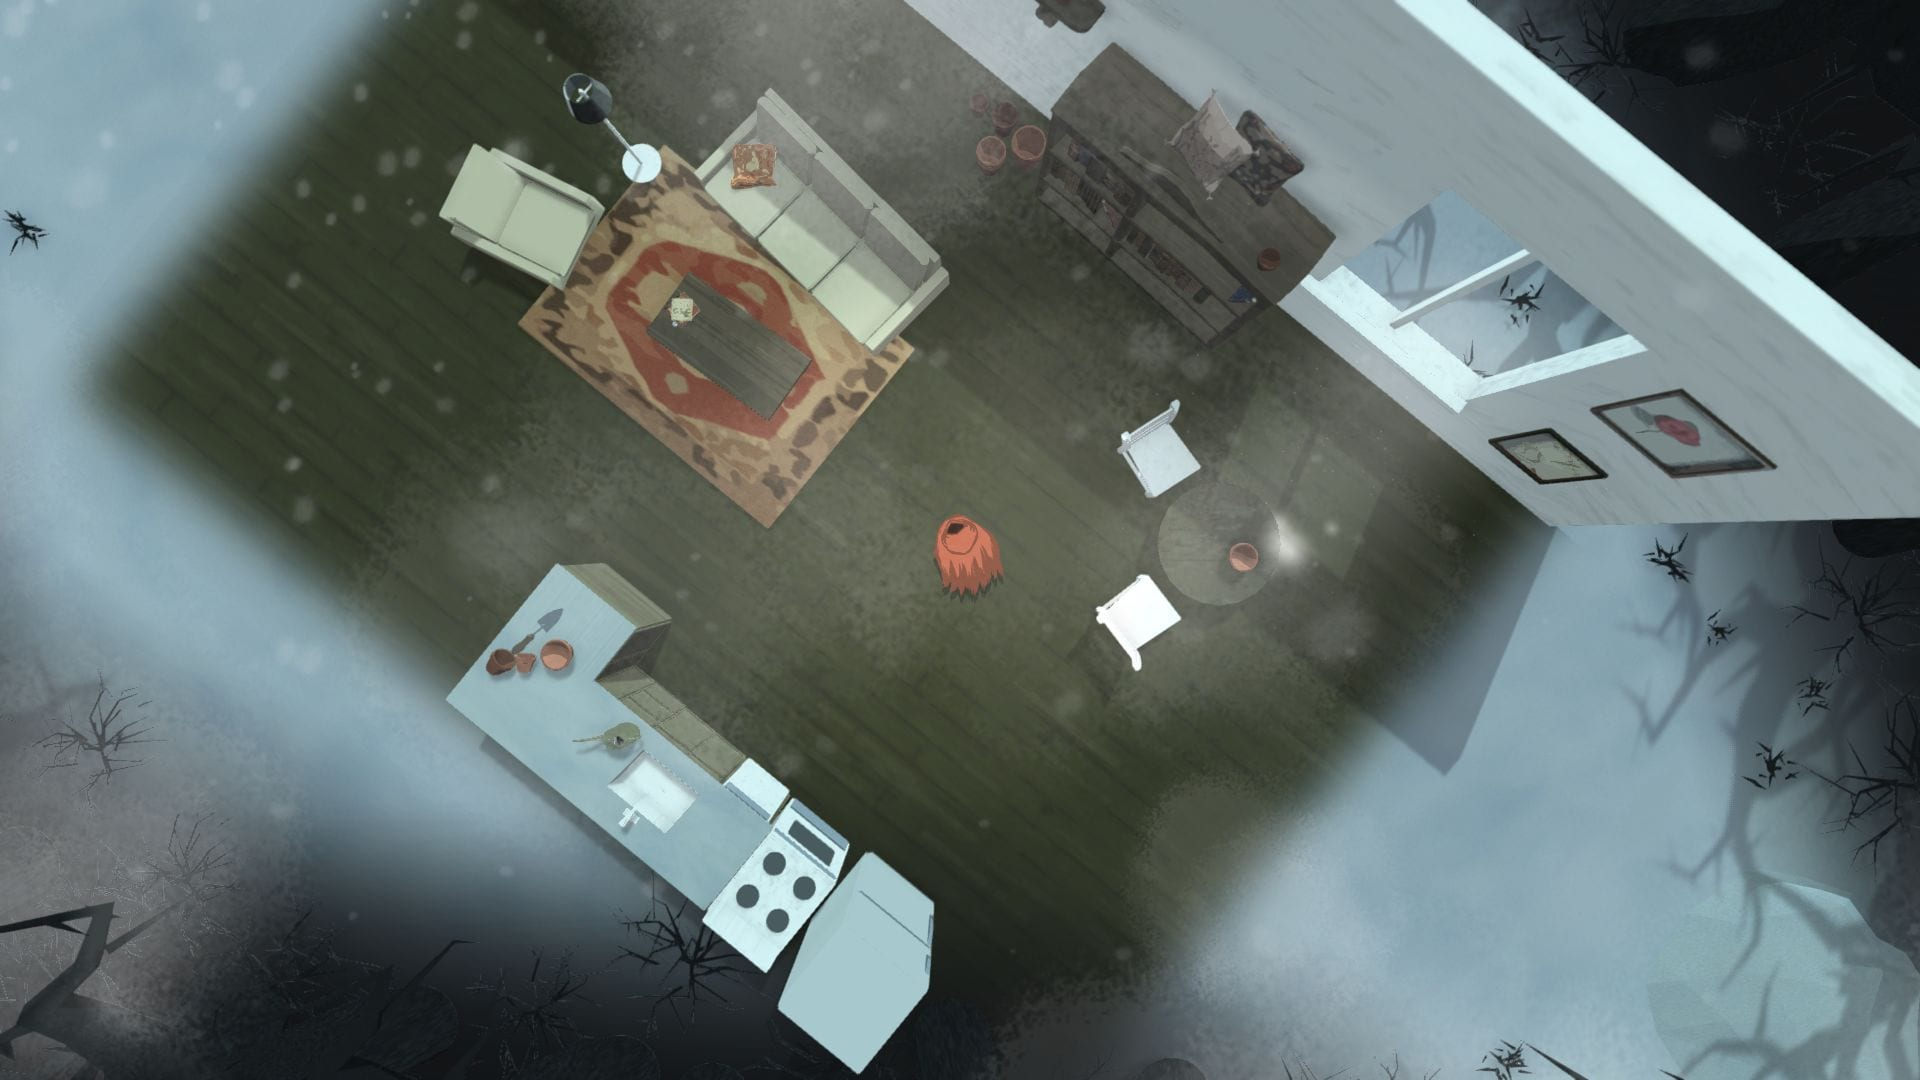 The Other Half screenshot, 2